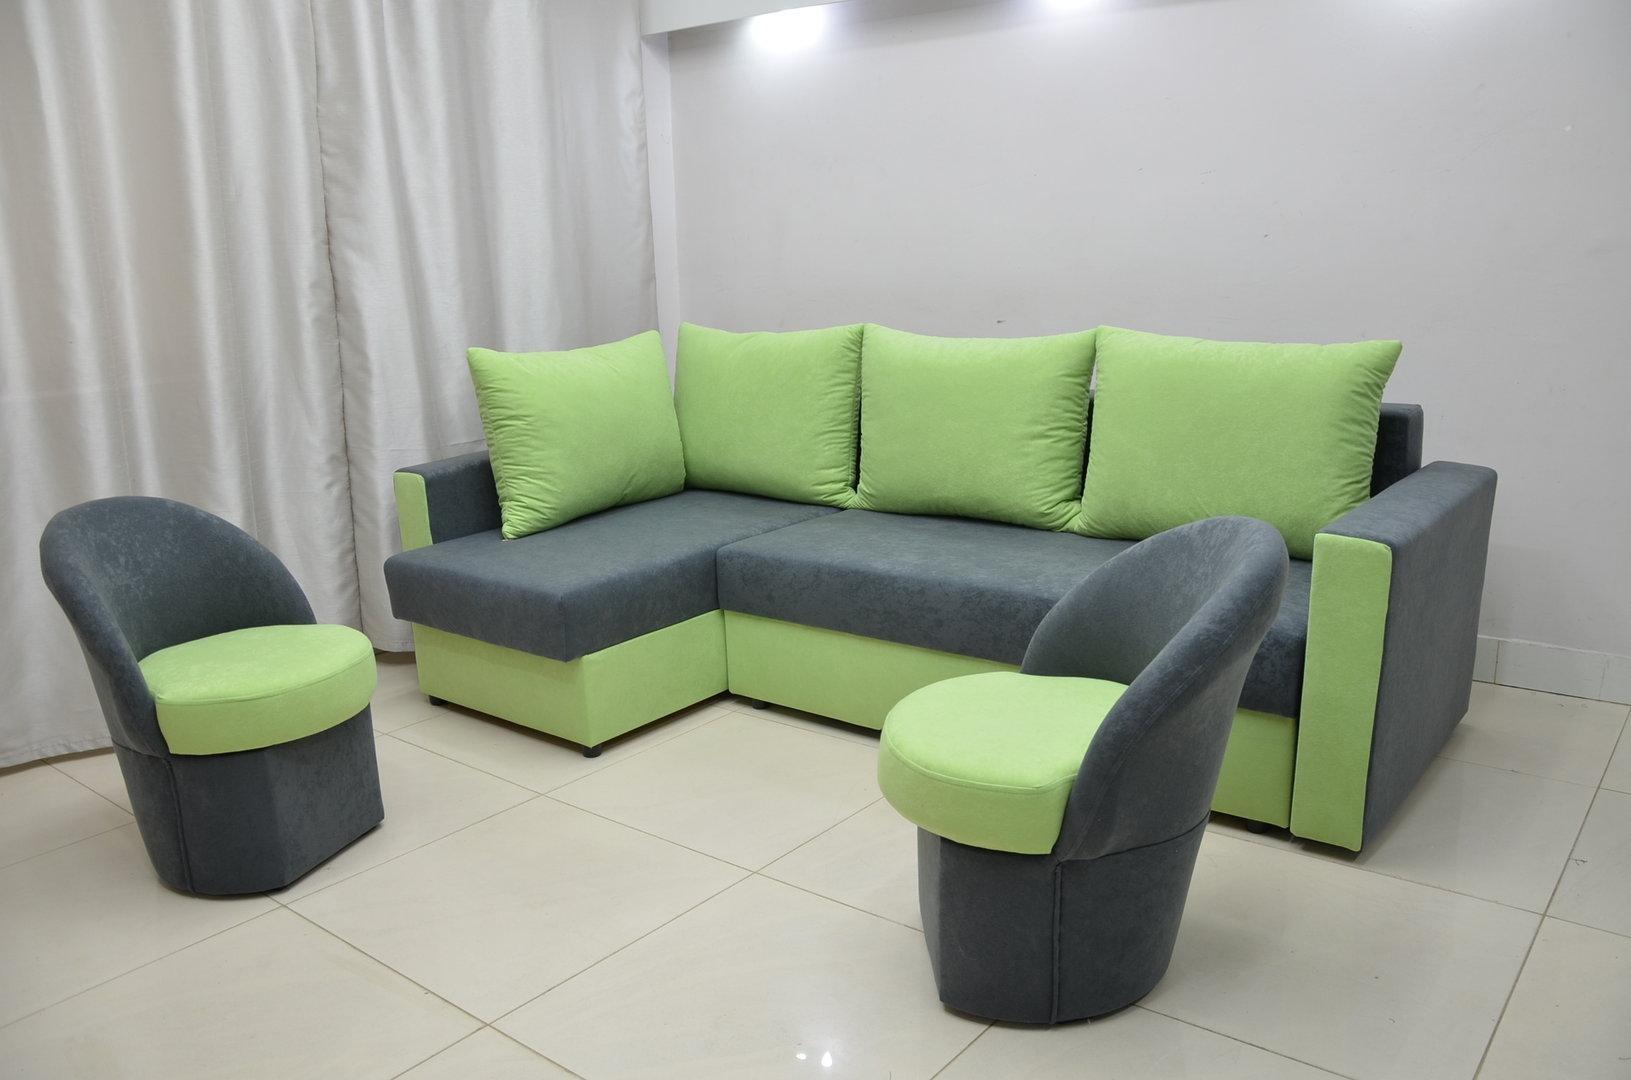 green fabric sofas sofa design institute philippines tuition fee 20 best ideas corner chairs